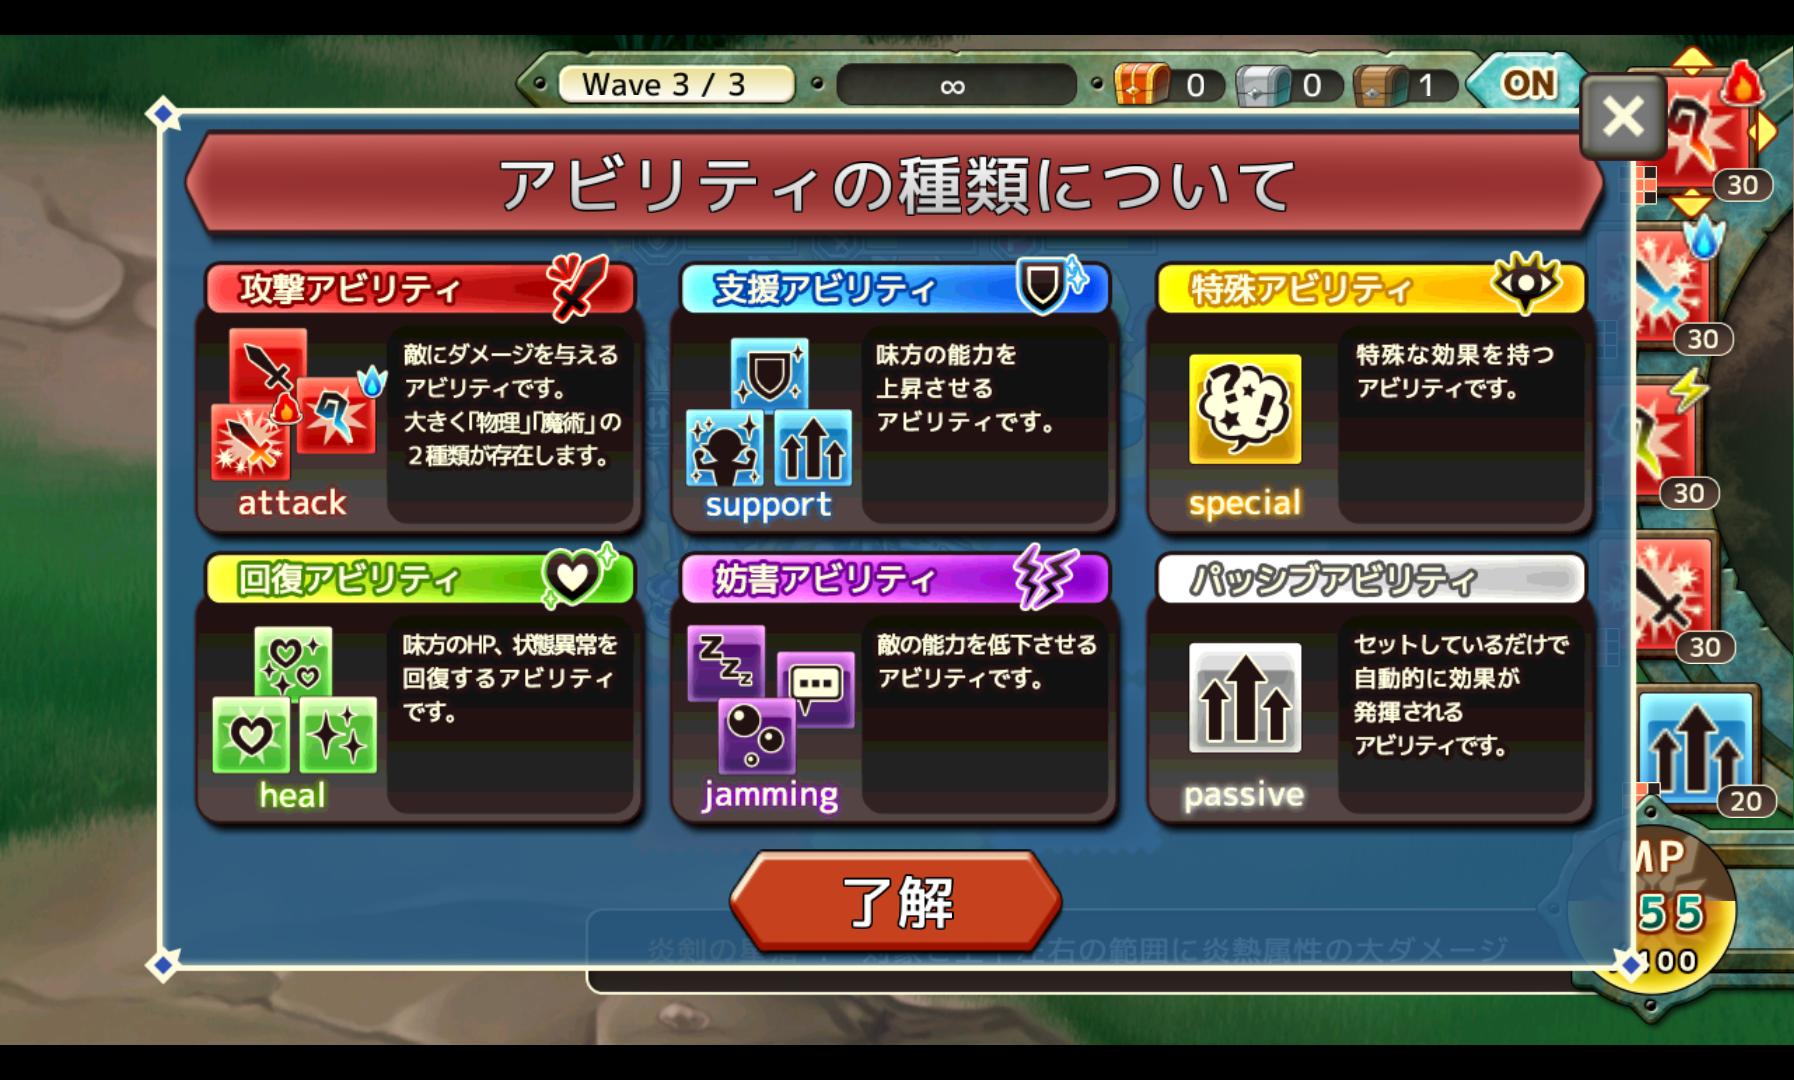 androidアプリ Re:Monster(リ・モンスター)〜ゴブリン転生記〜攻略スクリーンショット2